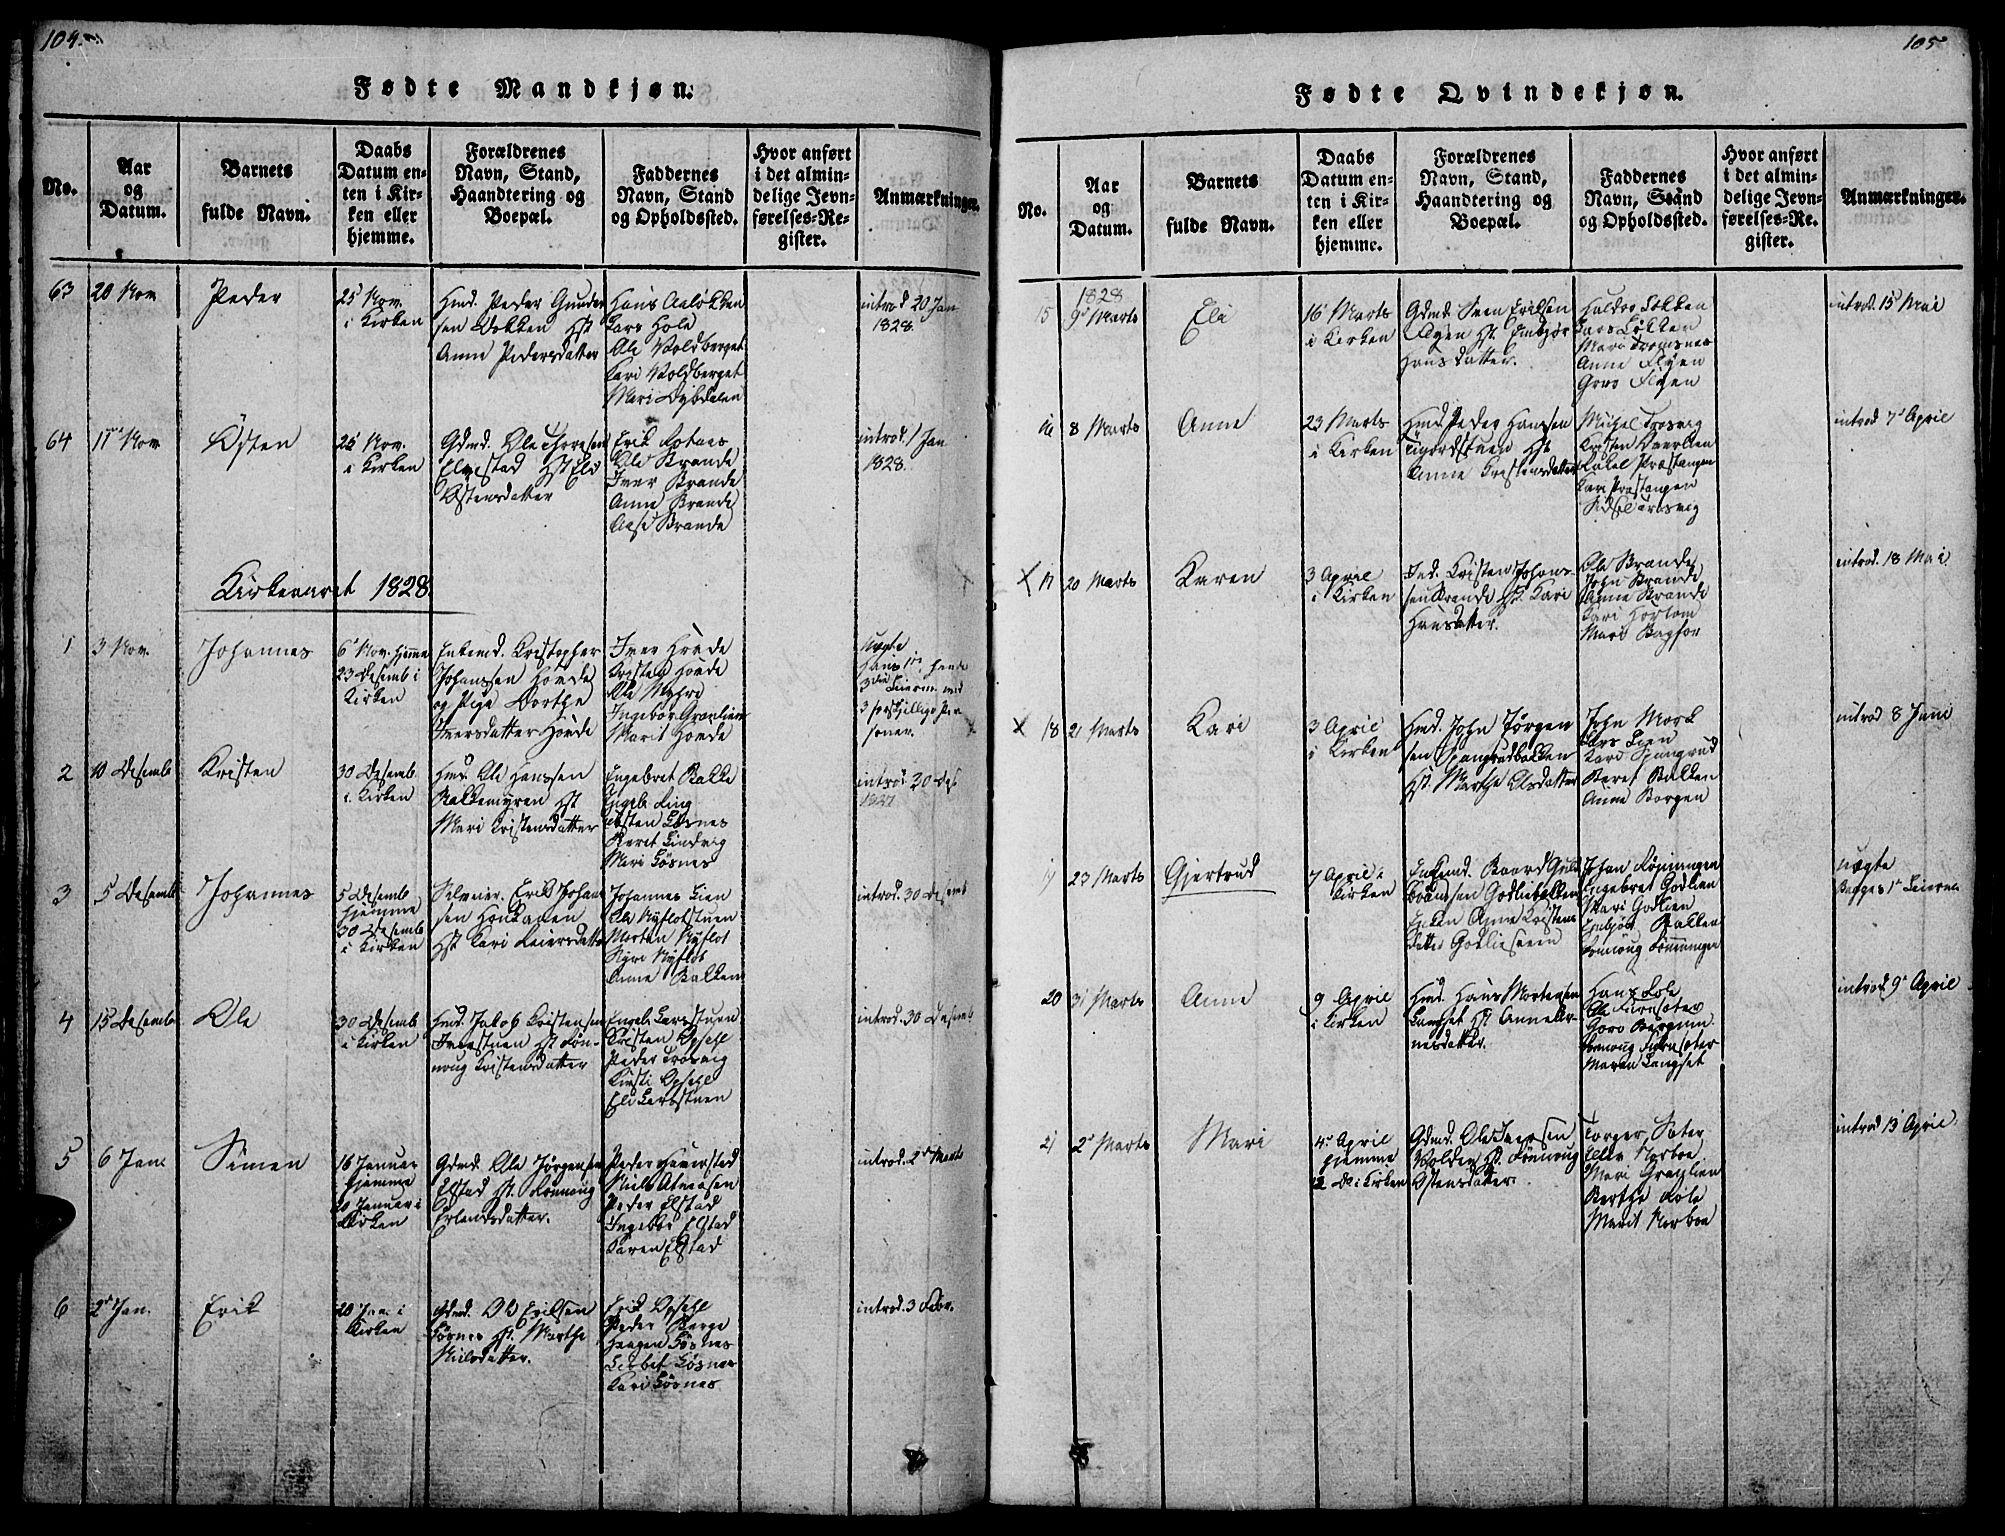 SAH, Ringebu prestekontor, Ministerialbok nr. 4, 1821-1839, s. 104-105